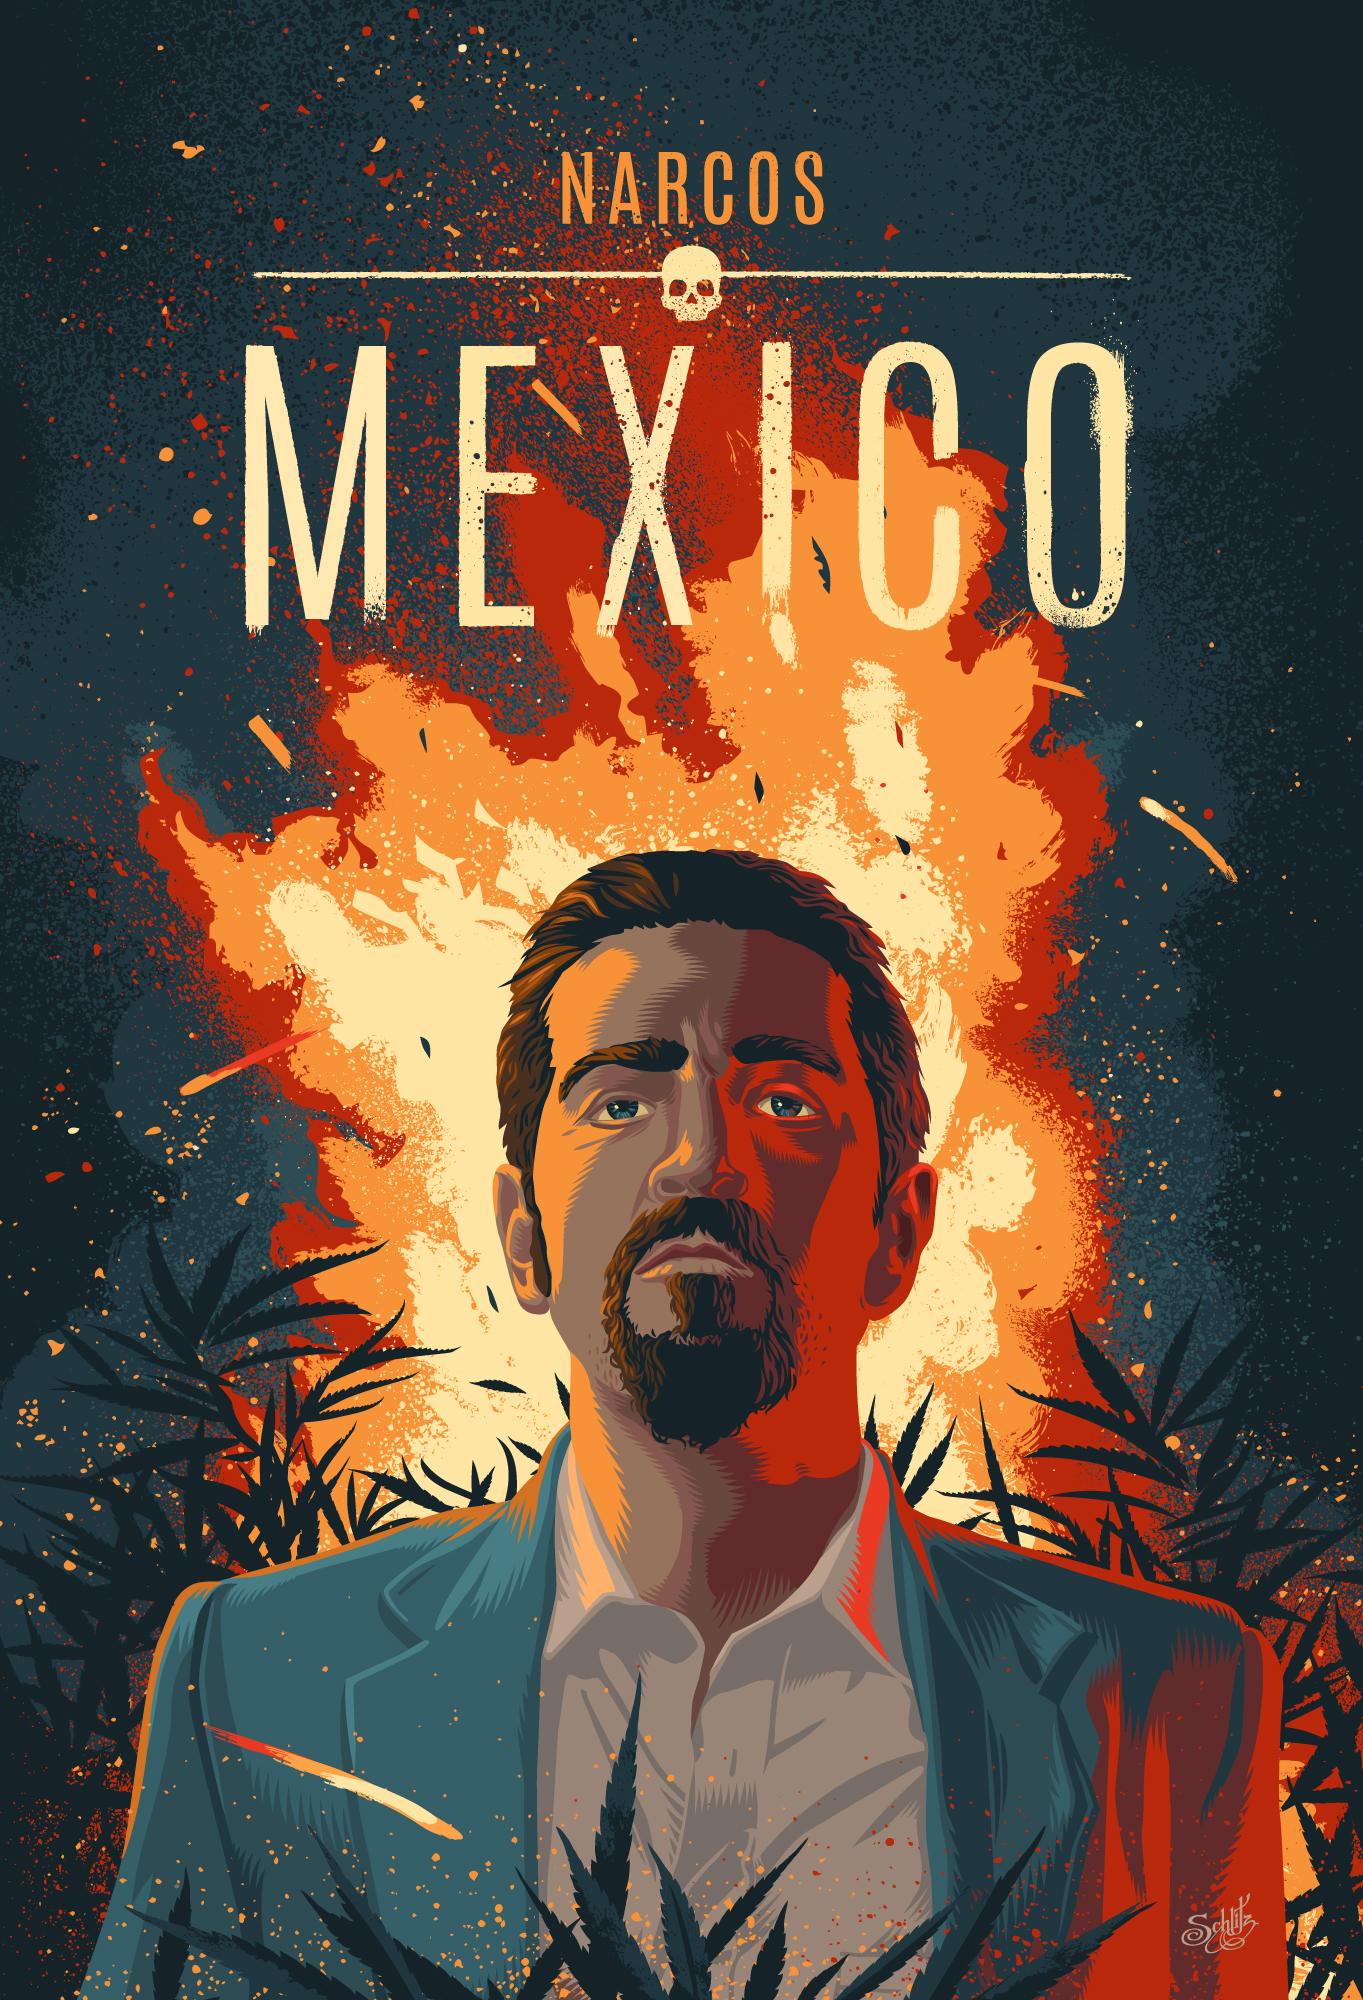 NarcosMexico.jpg?format=1500w